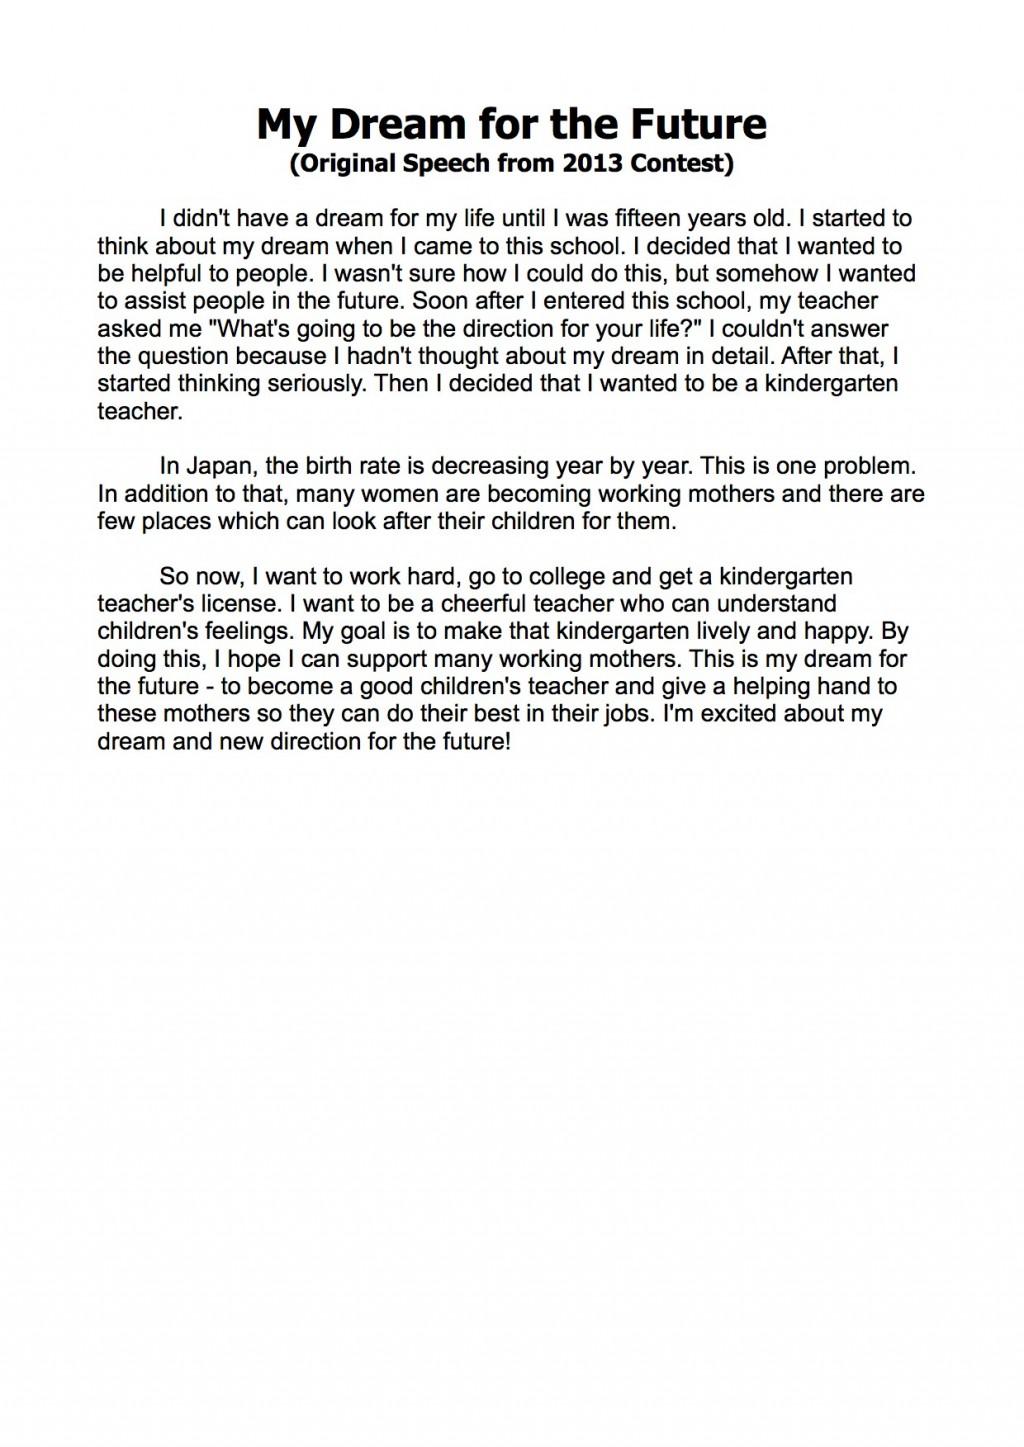 002 Dream Essay Unbelievable Lucid Conclusion College Examples Introduction Large